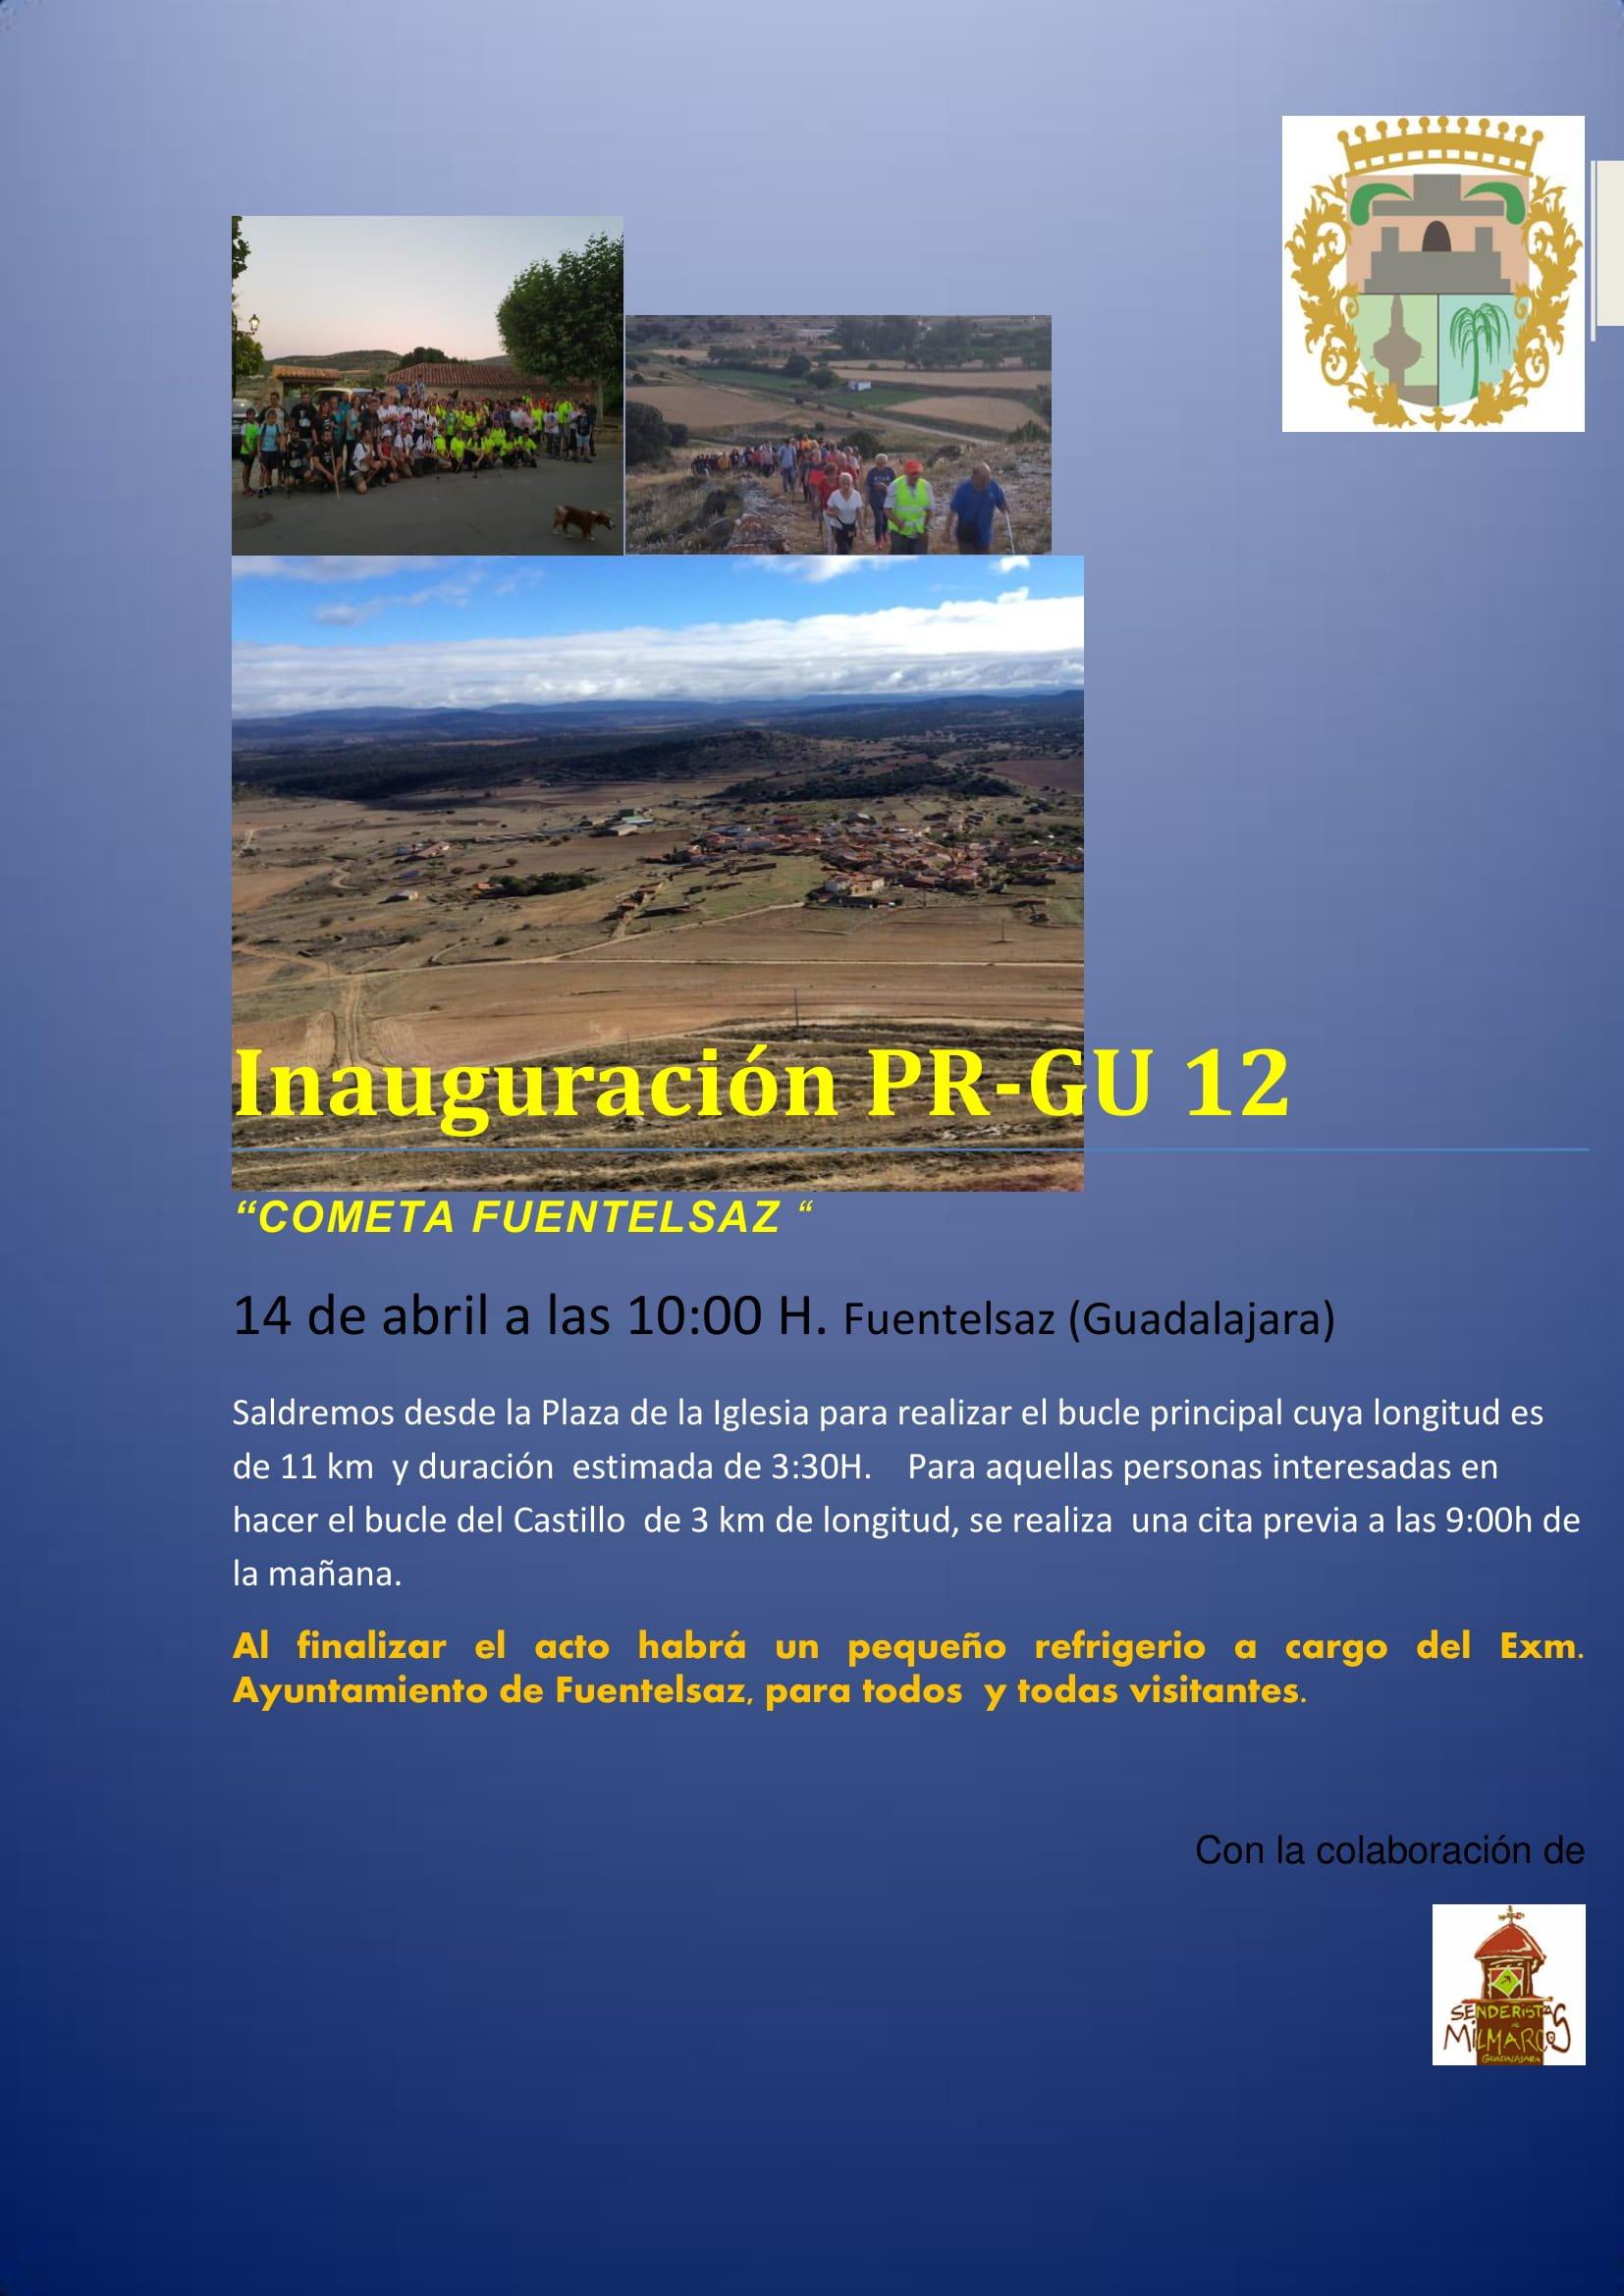 Se inaugura la ruta PR-GU 12 «Cometa de Fuentelsaz»